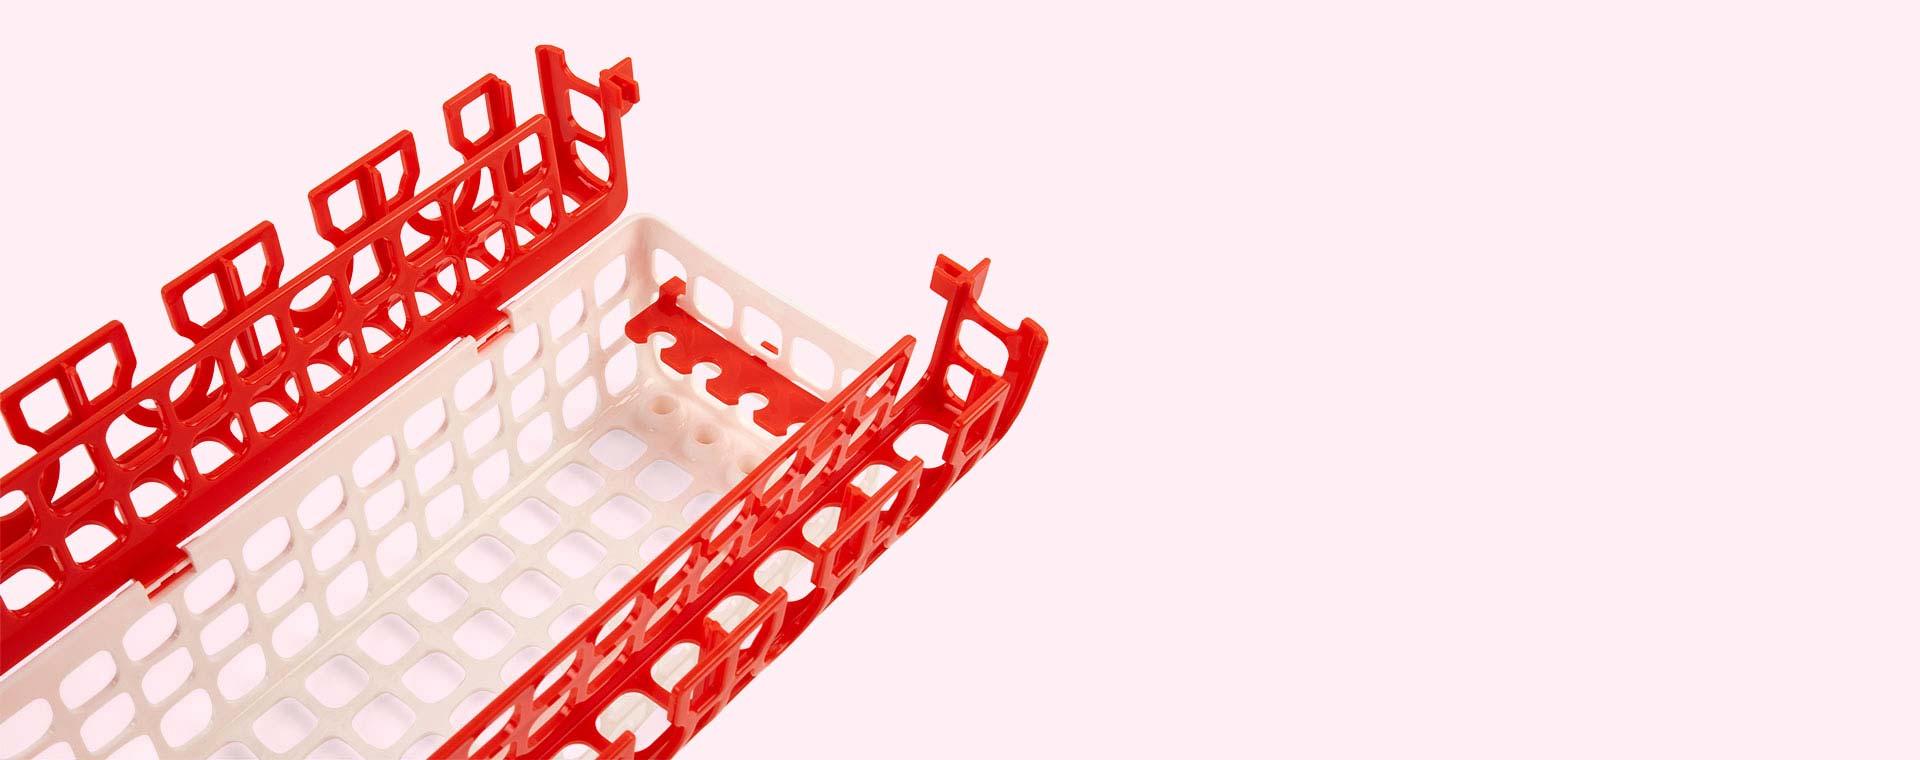 White Oxo Tot Dishwasher Basket